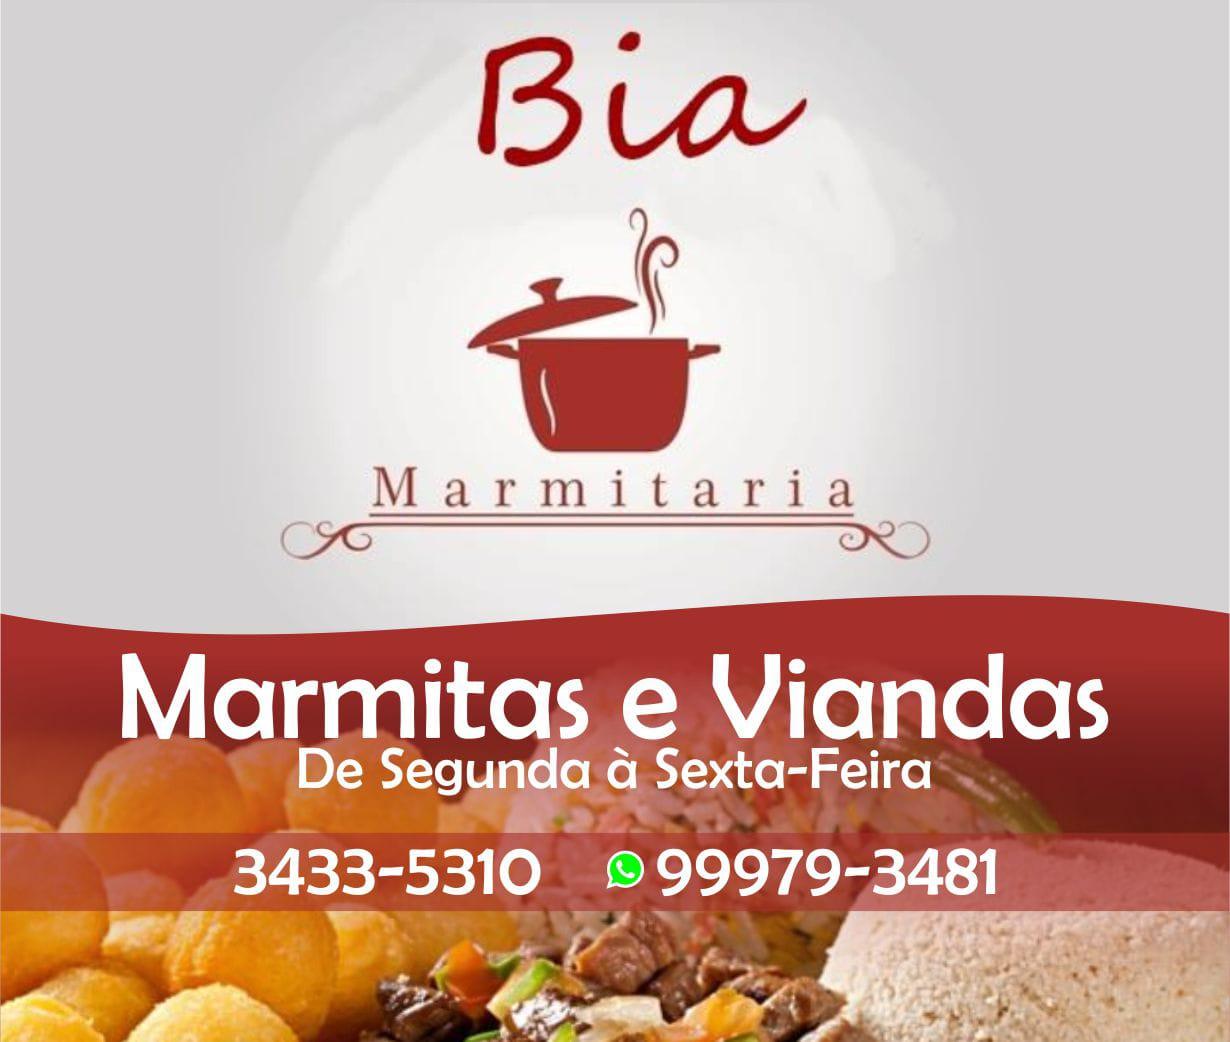 Bia – Marmitas